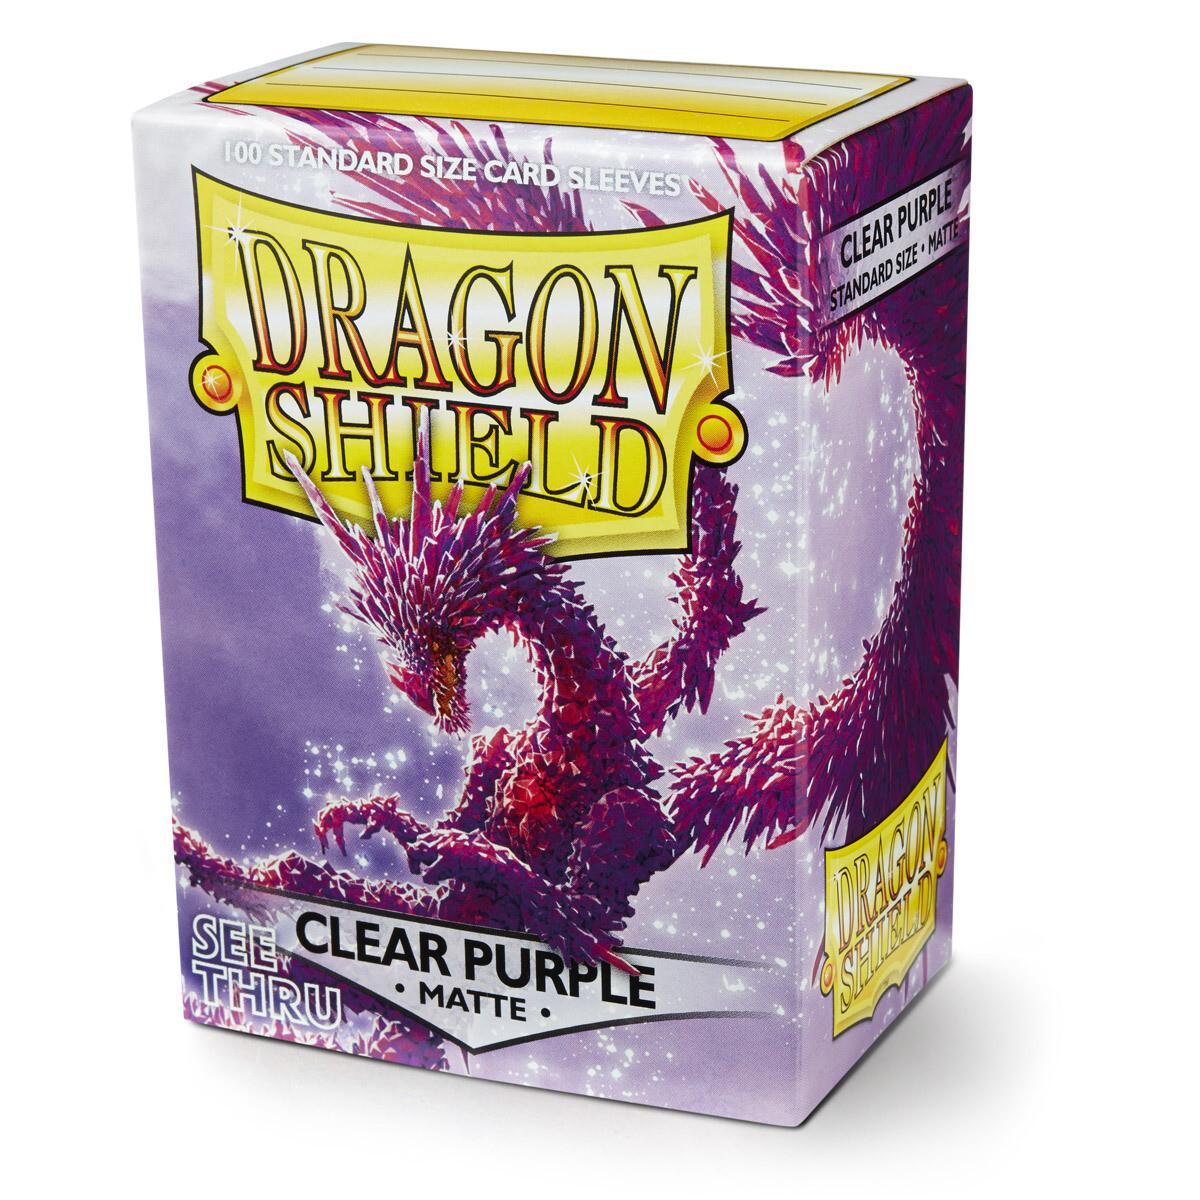 Dragon Shield 100 Sleeves - Matte Clear Purple